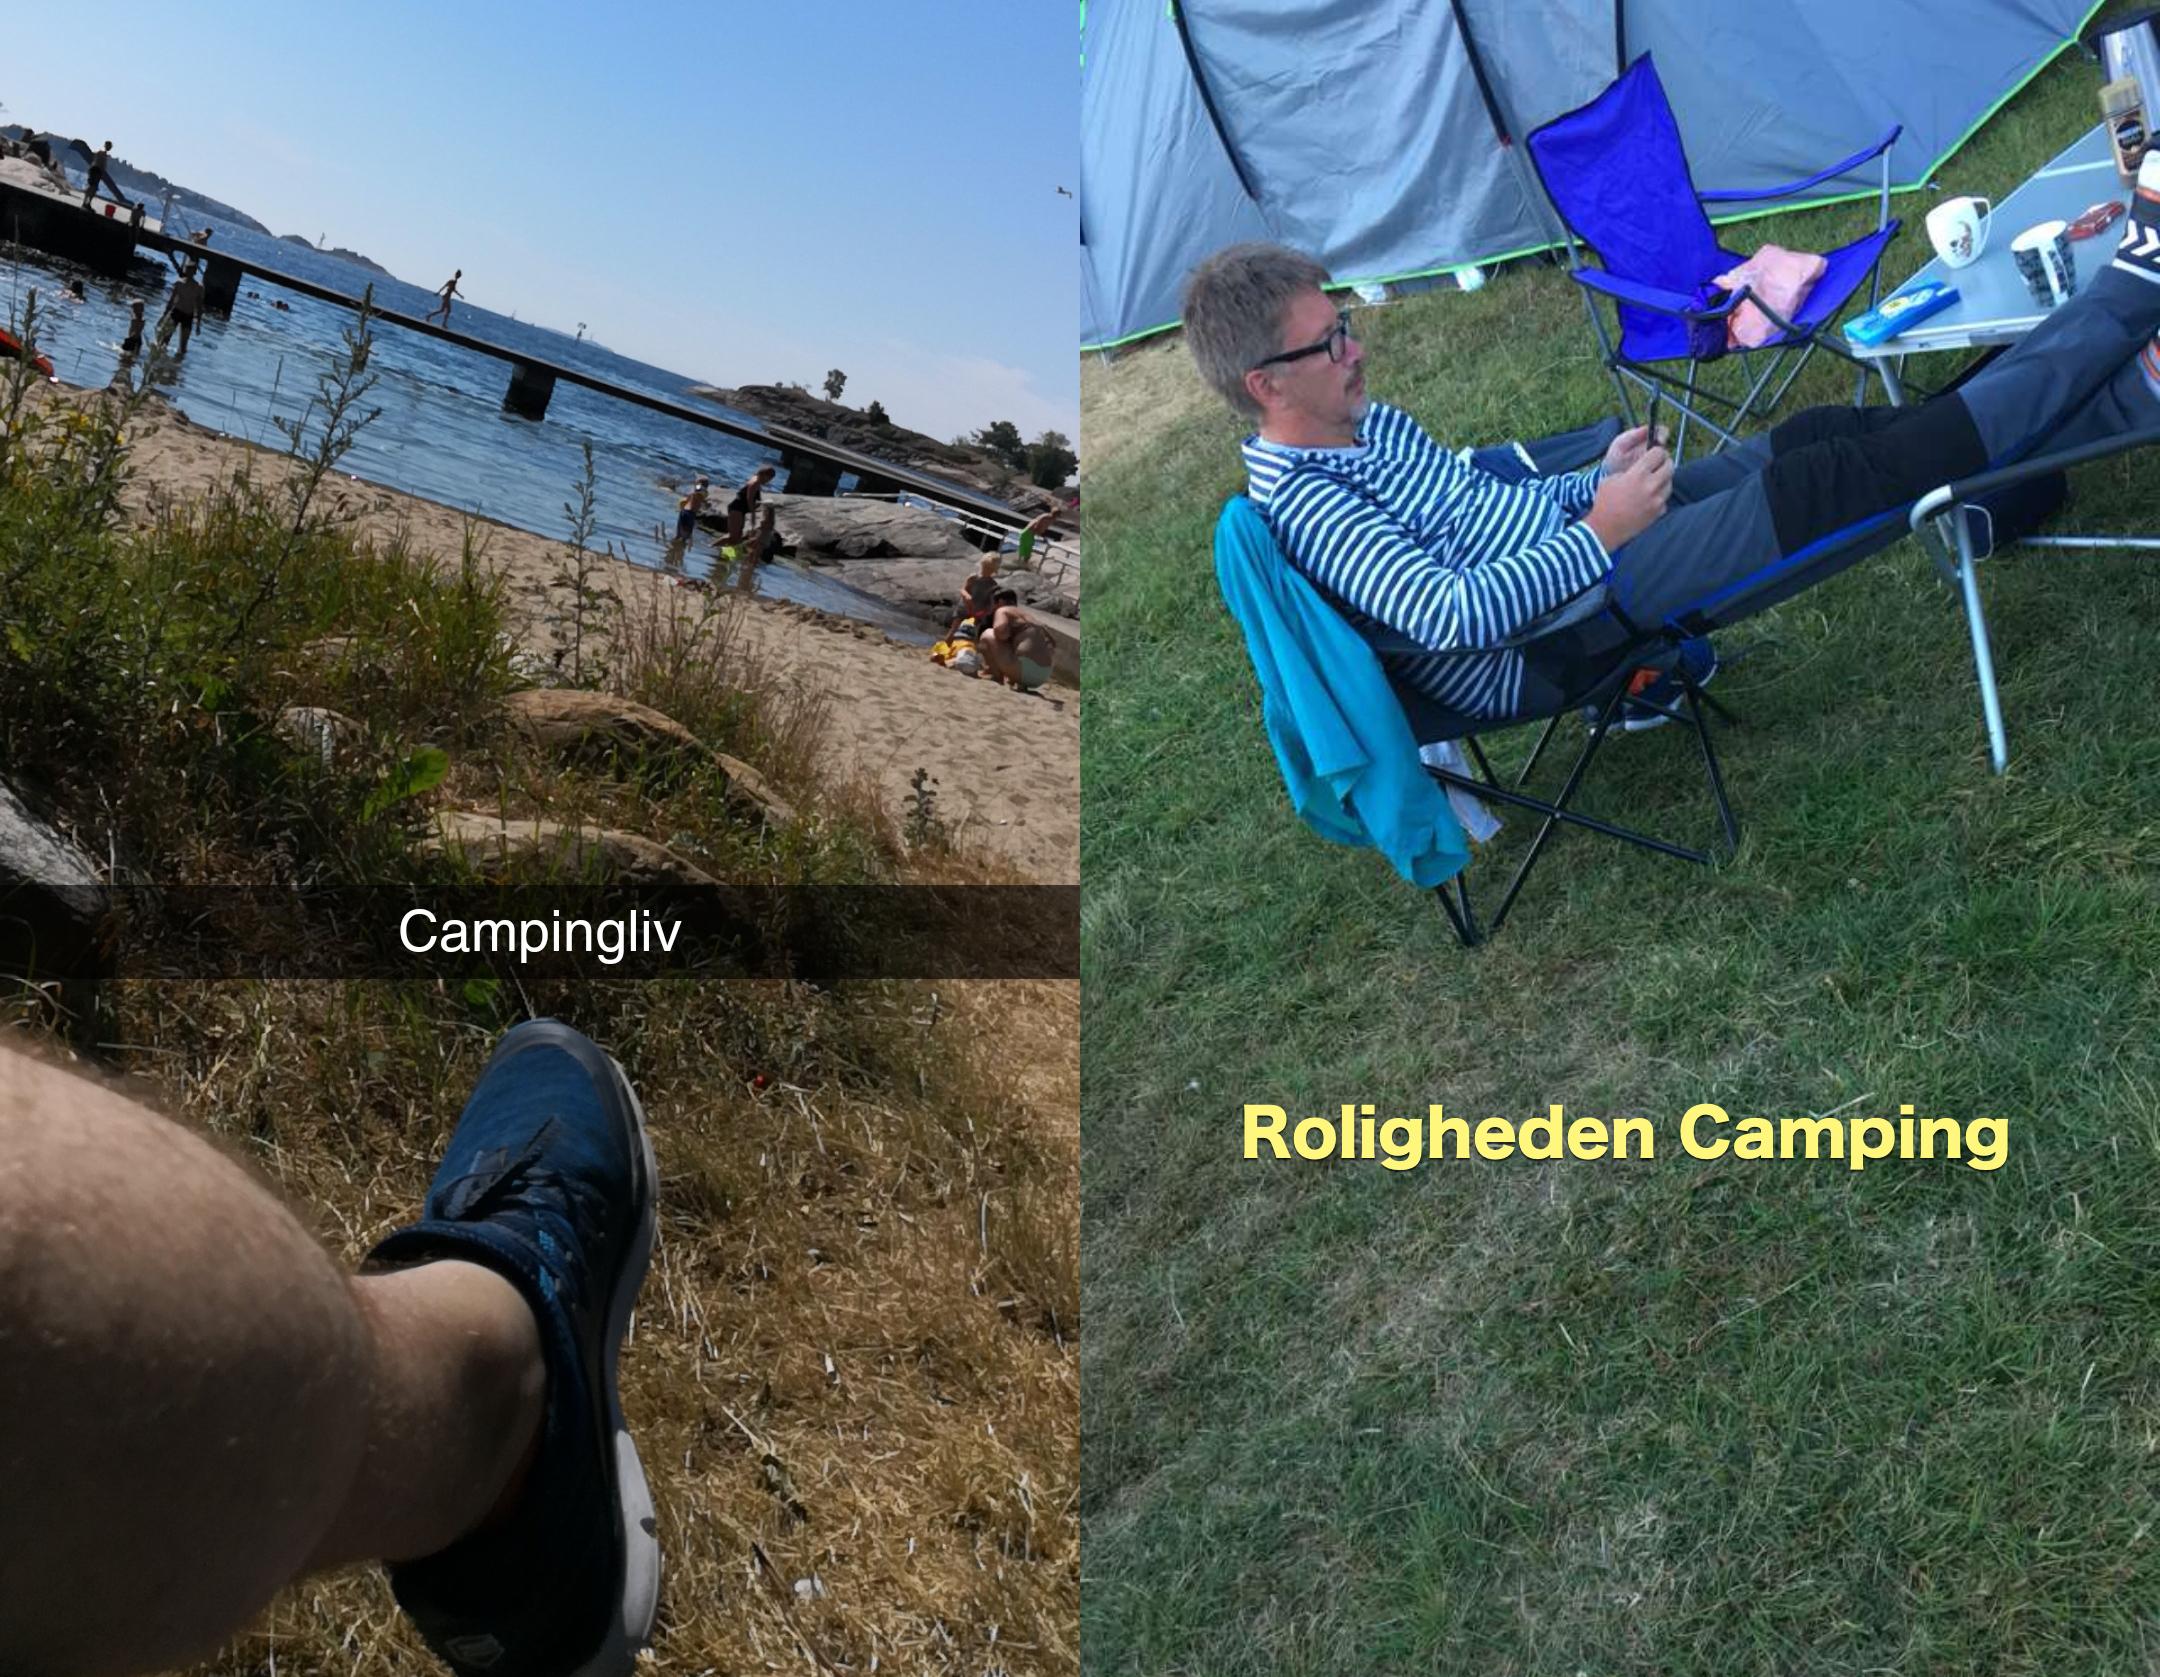 Roligheden Camping